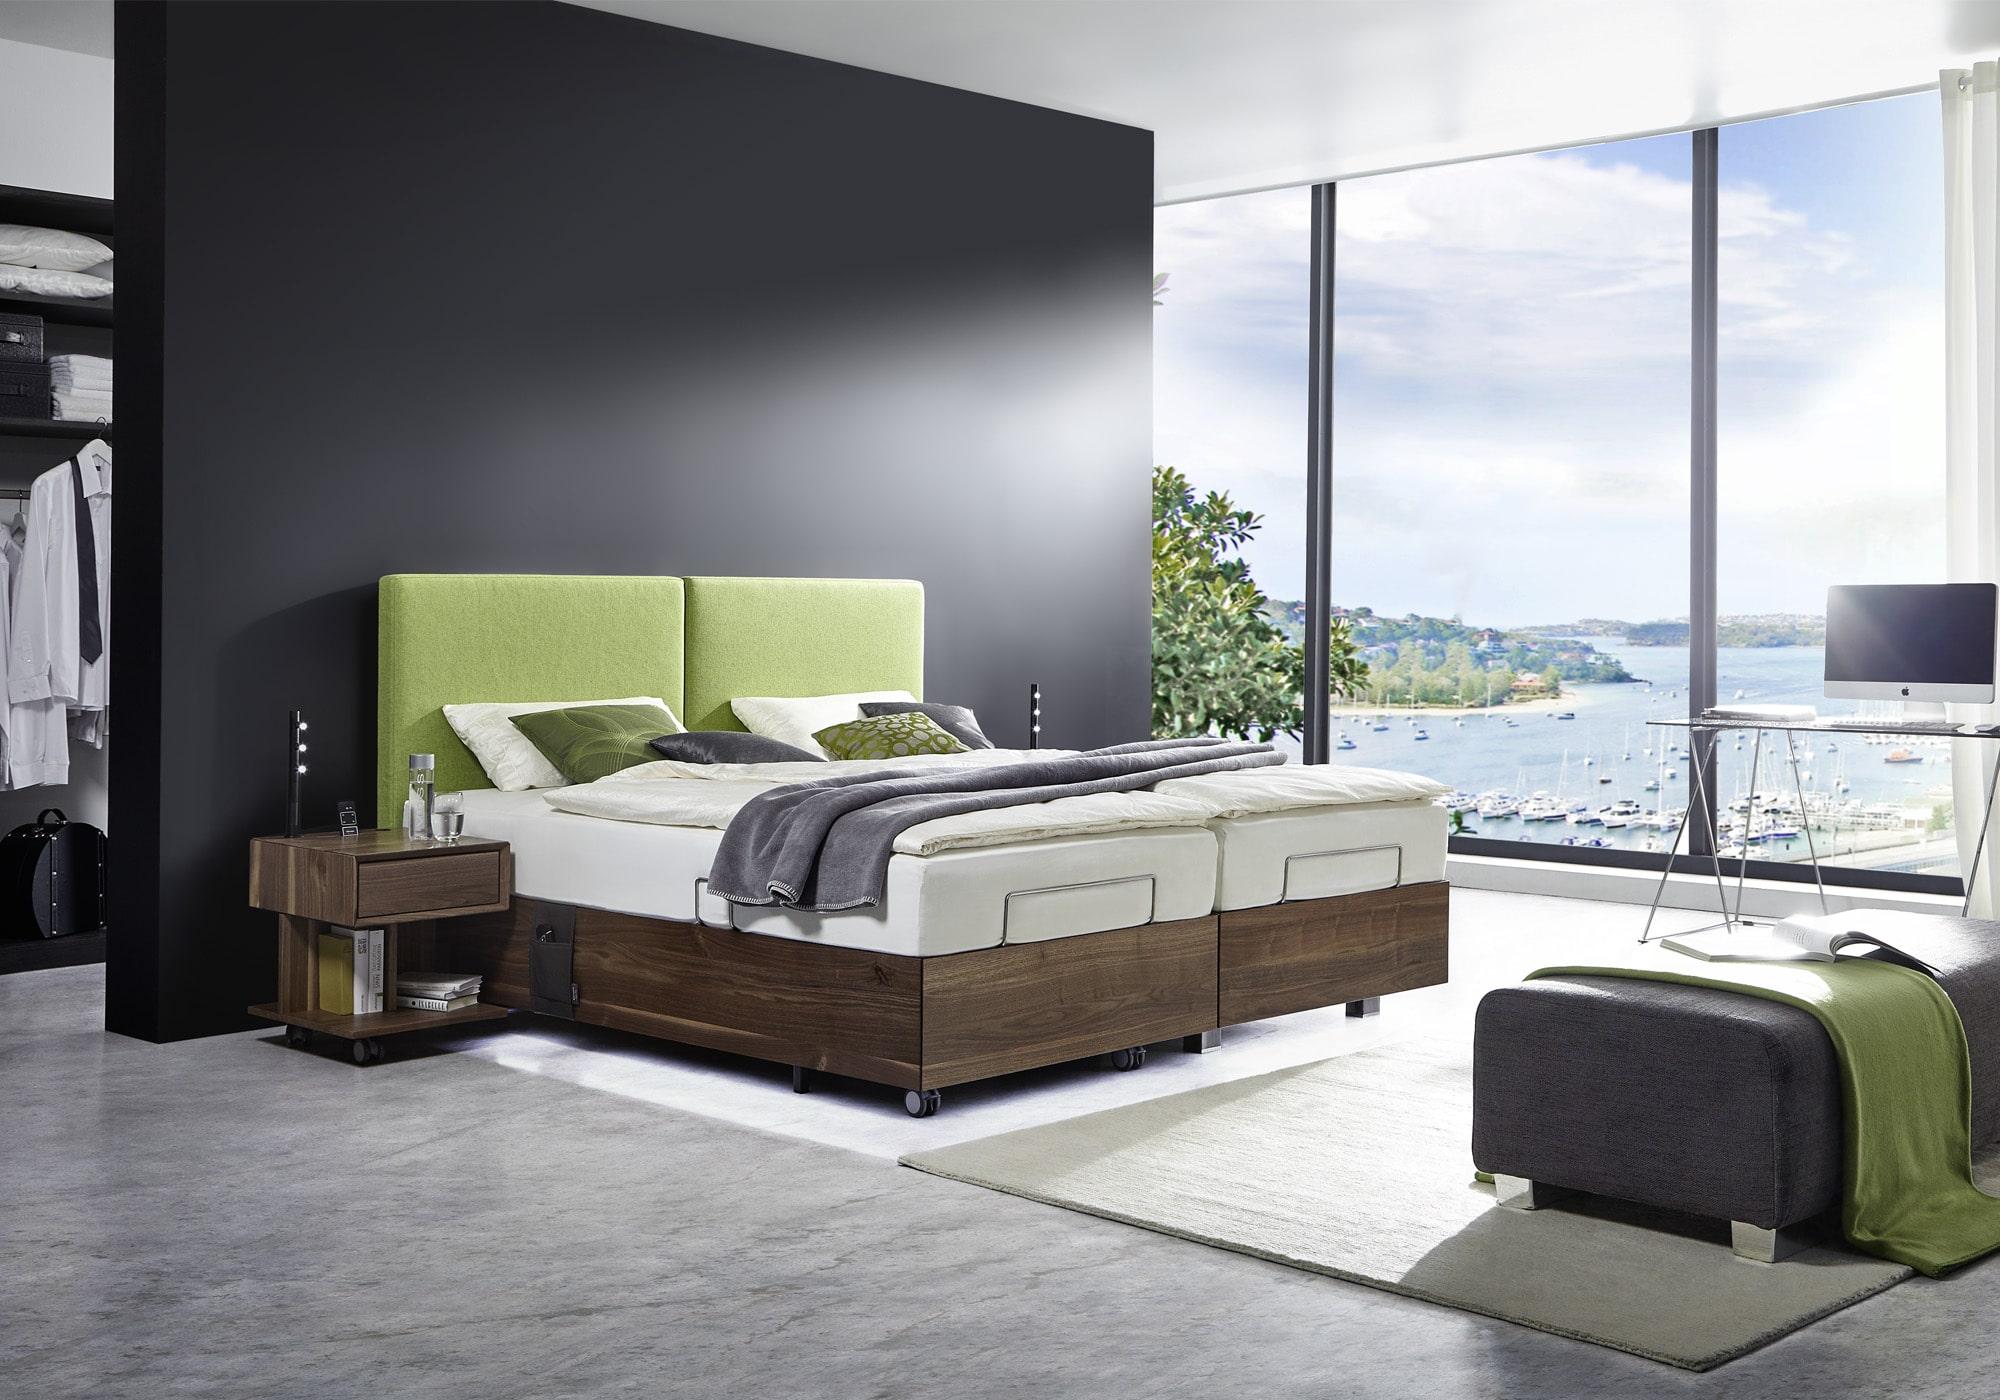 kirchner massivholzbett davos nussbaum mit polsterkopfteil loden betten kraft. Black Bedroom Furniture Sets. Home Design Ideas